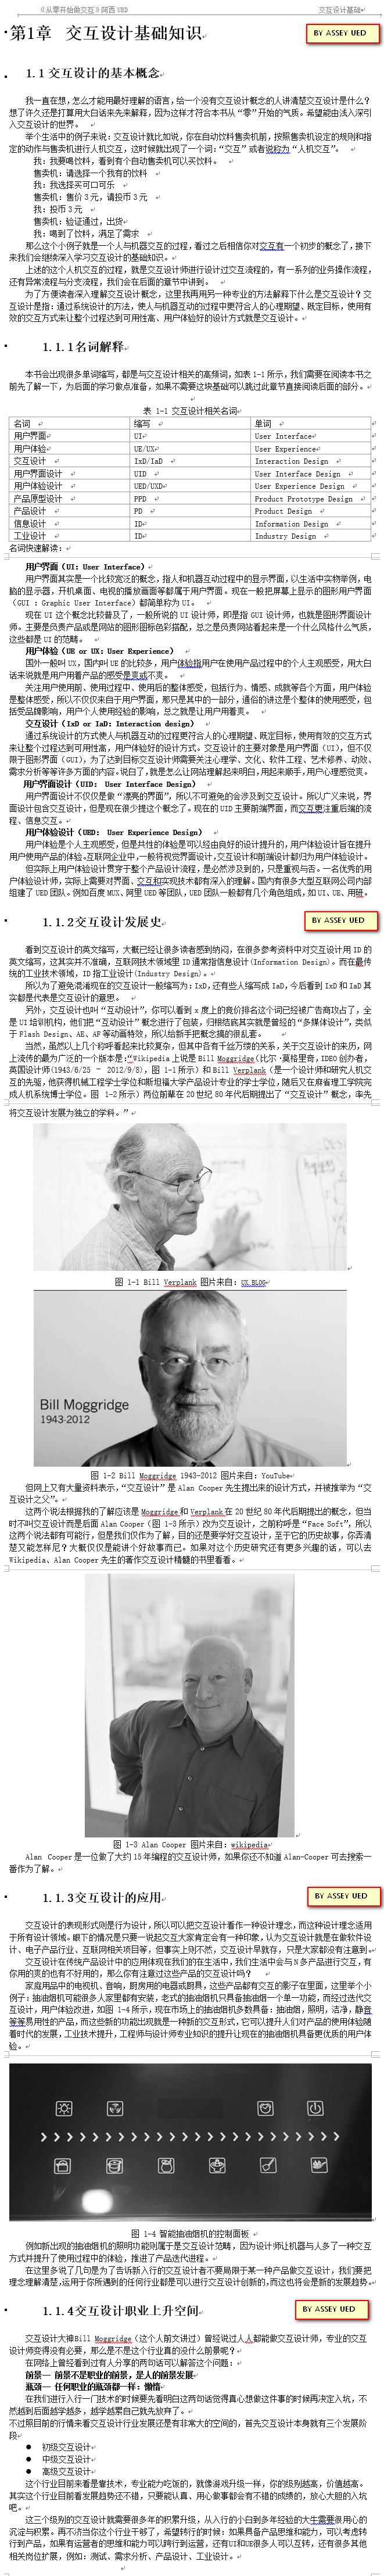 2016-02-19_092441